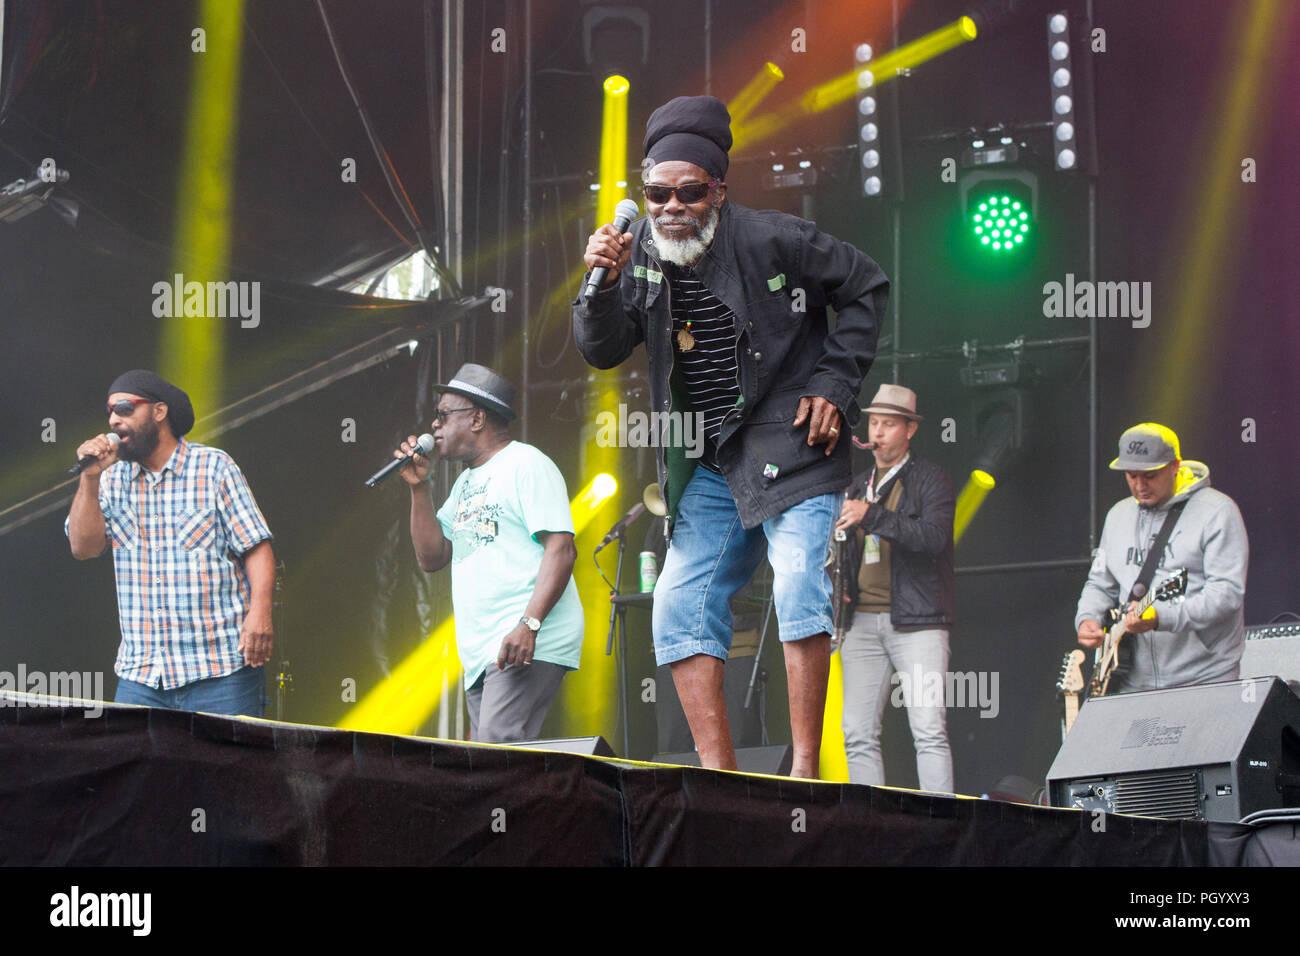 Bratislava, Slovakia. 25th August, 2018. Jamaican harmony trio Mighty Diamonds performs at Uprising Music Festival. - Stock Image